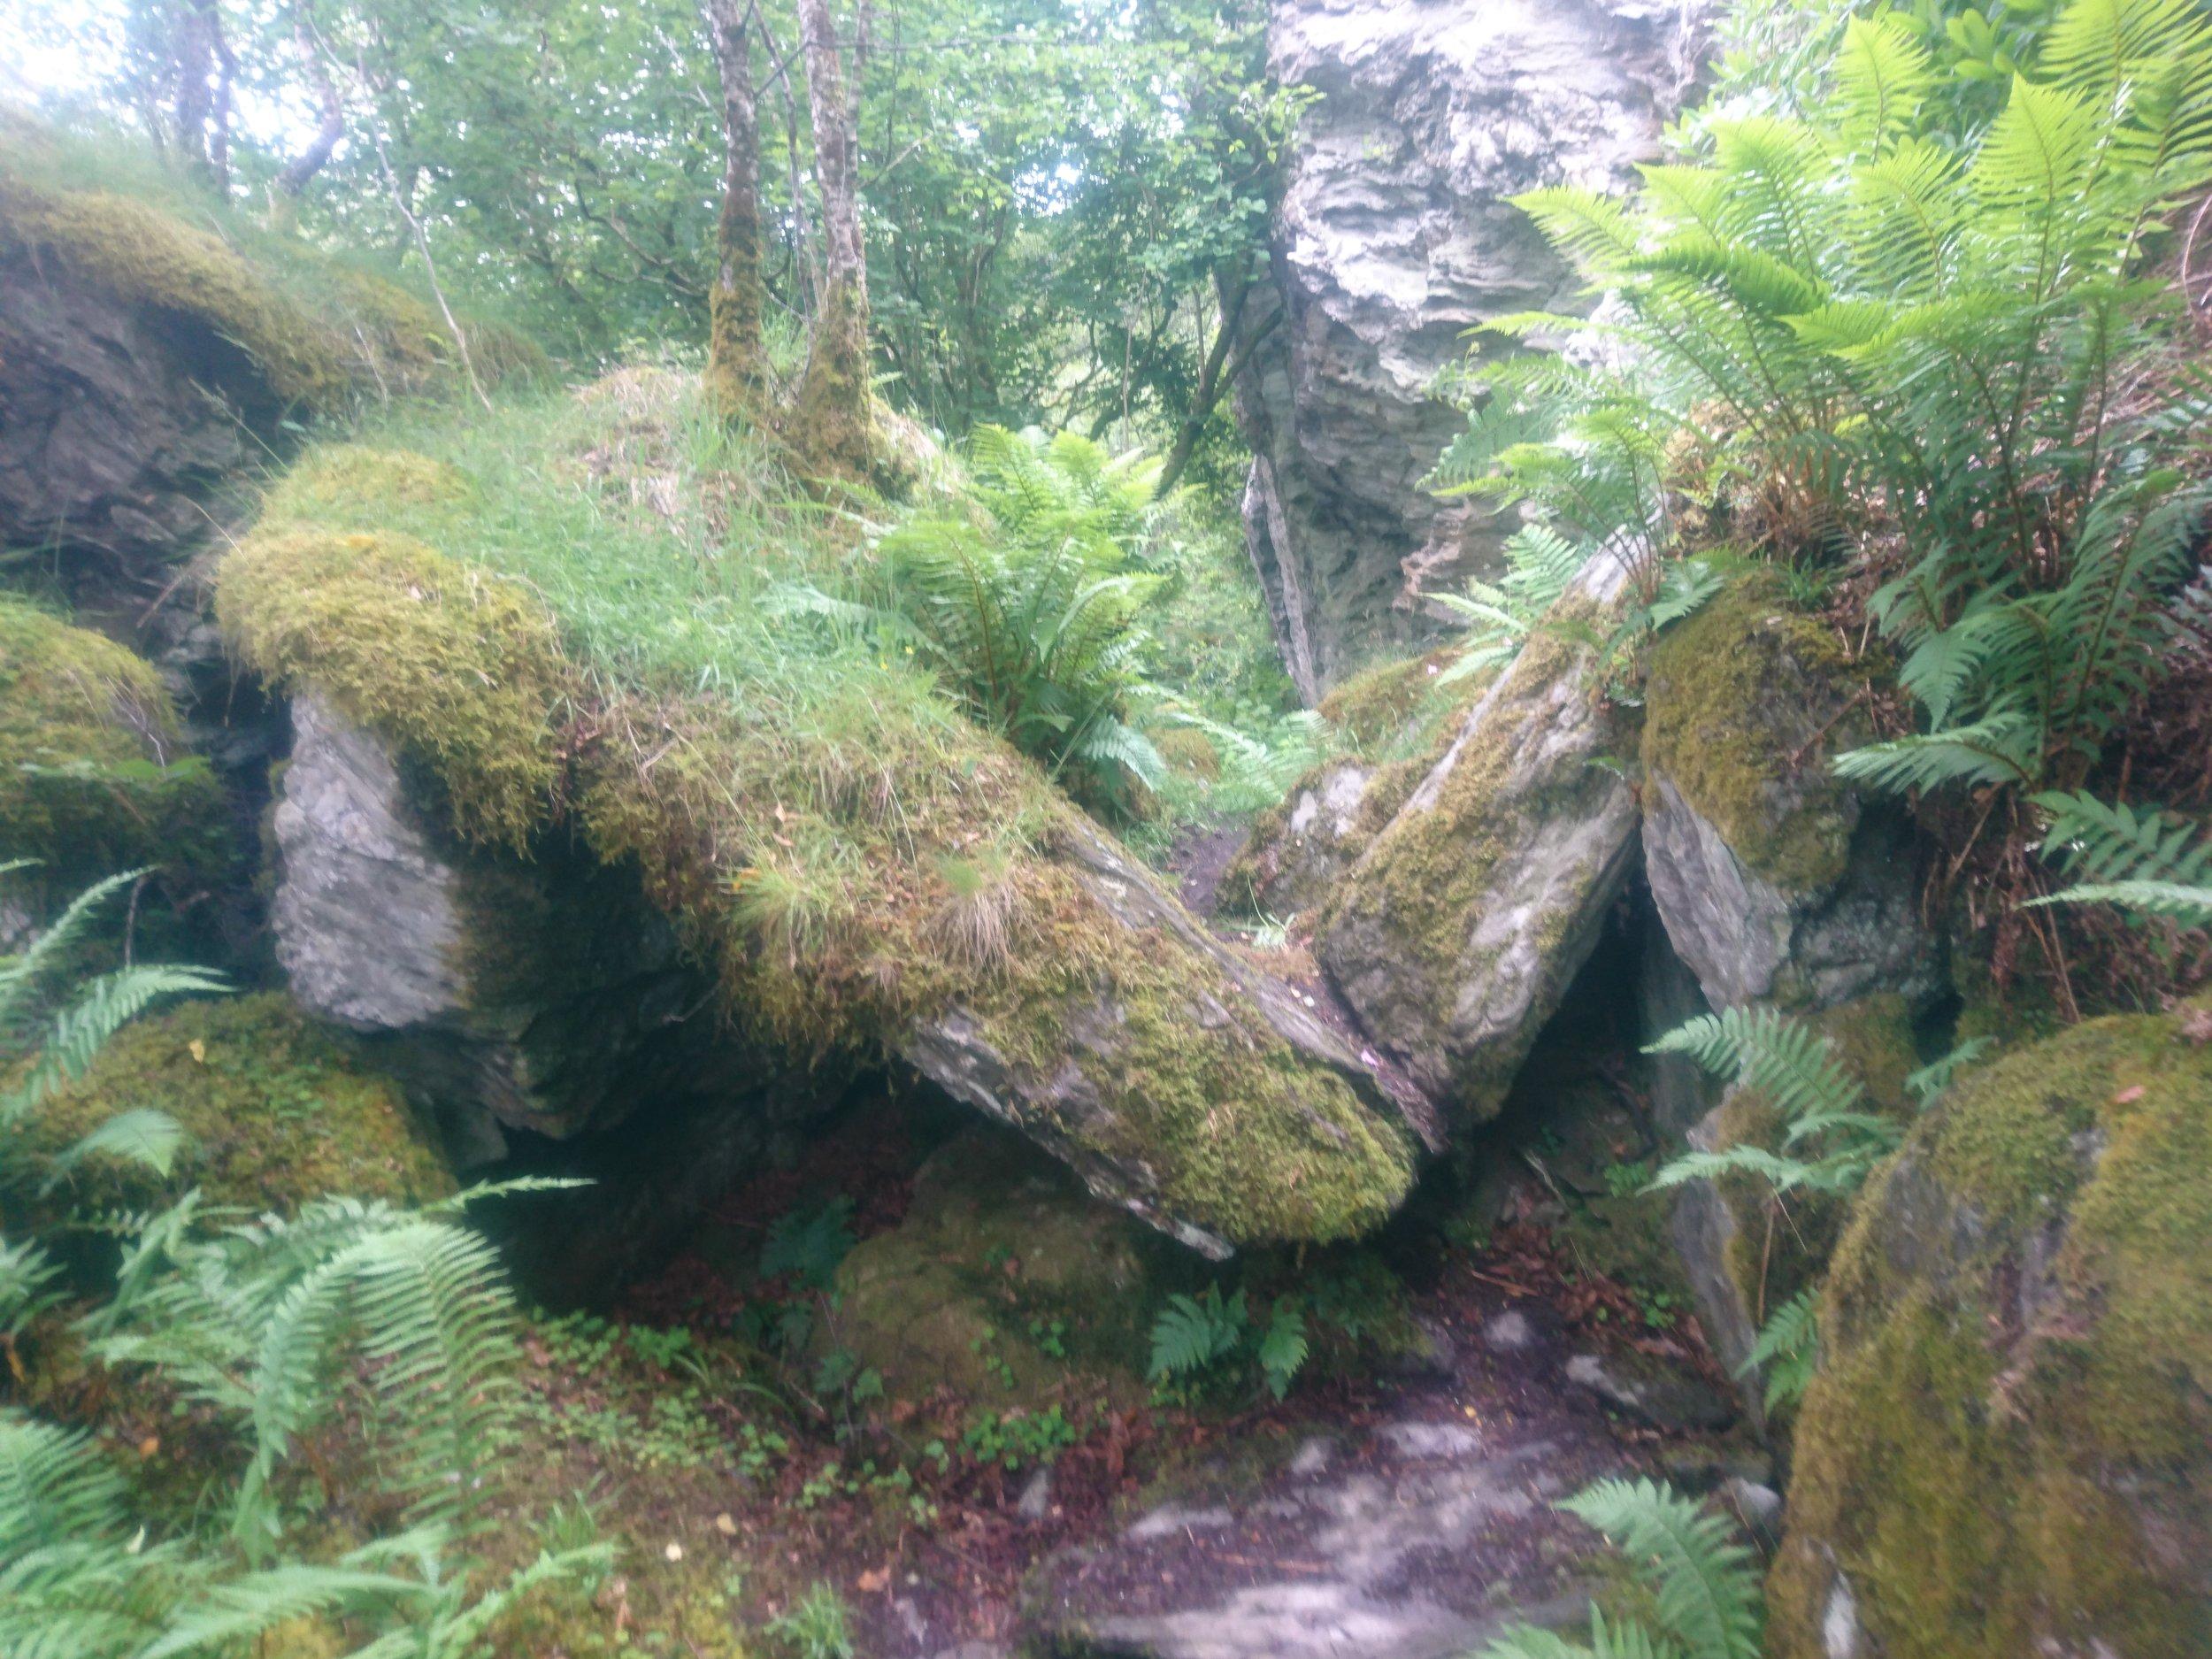 Path between the Rocks